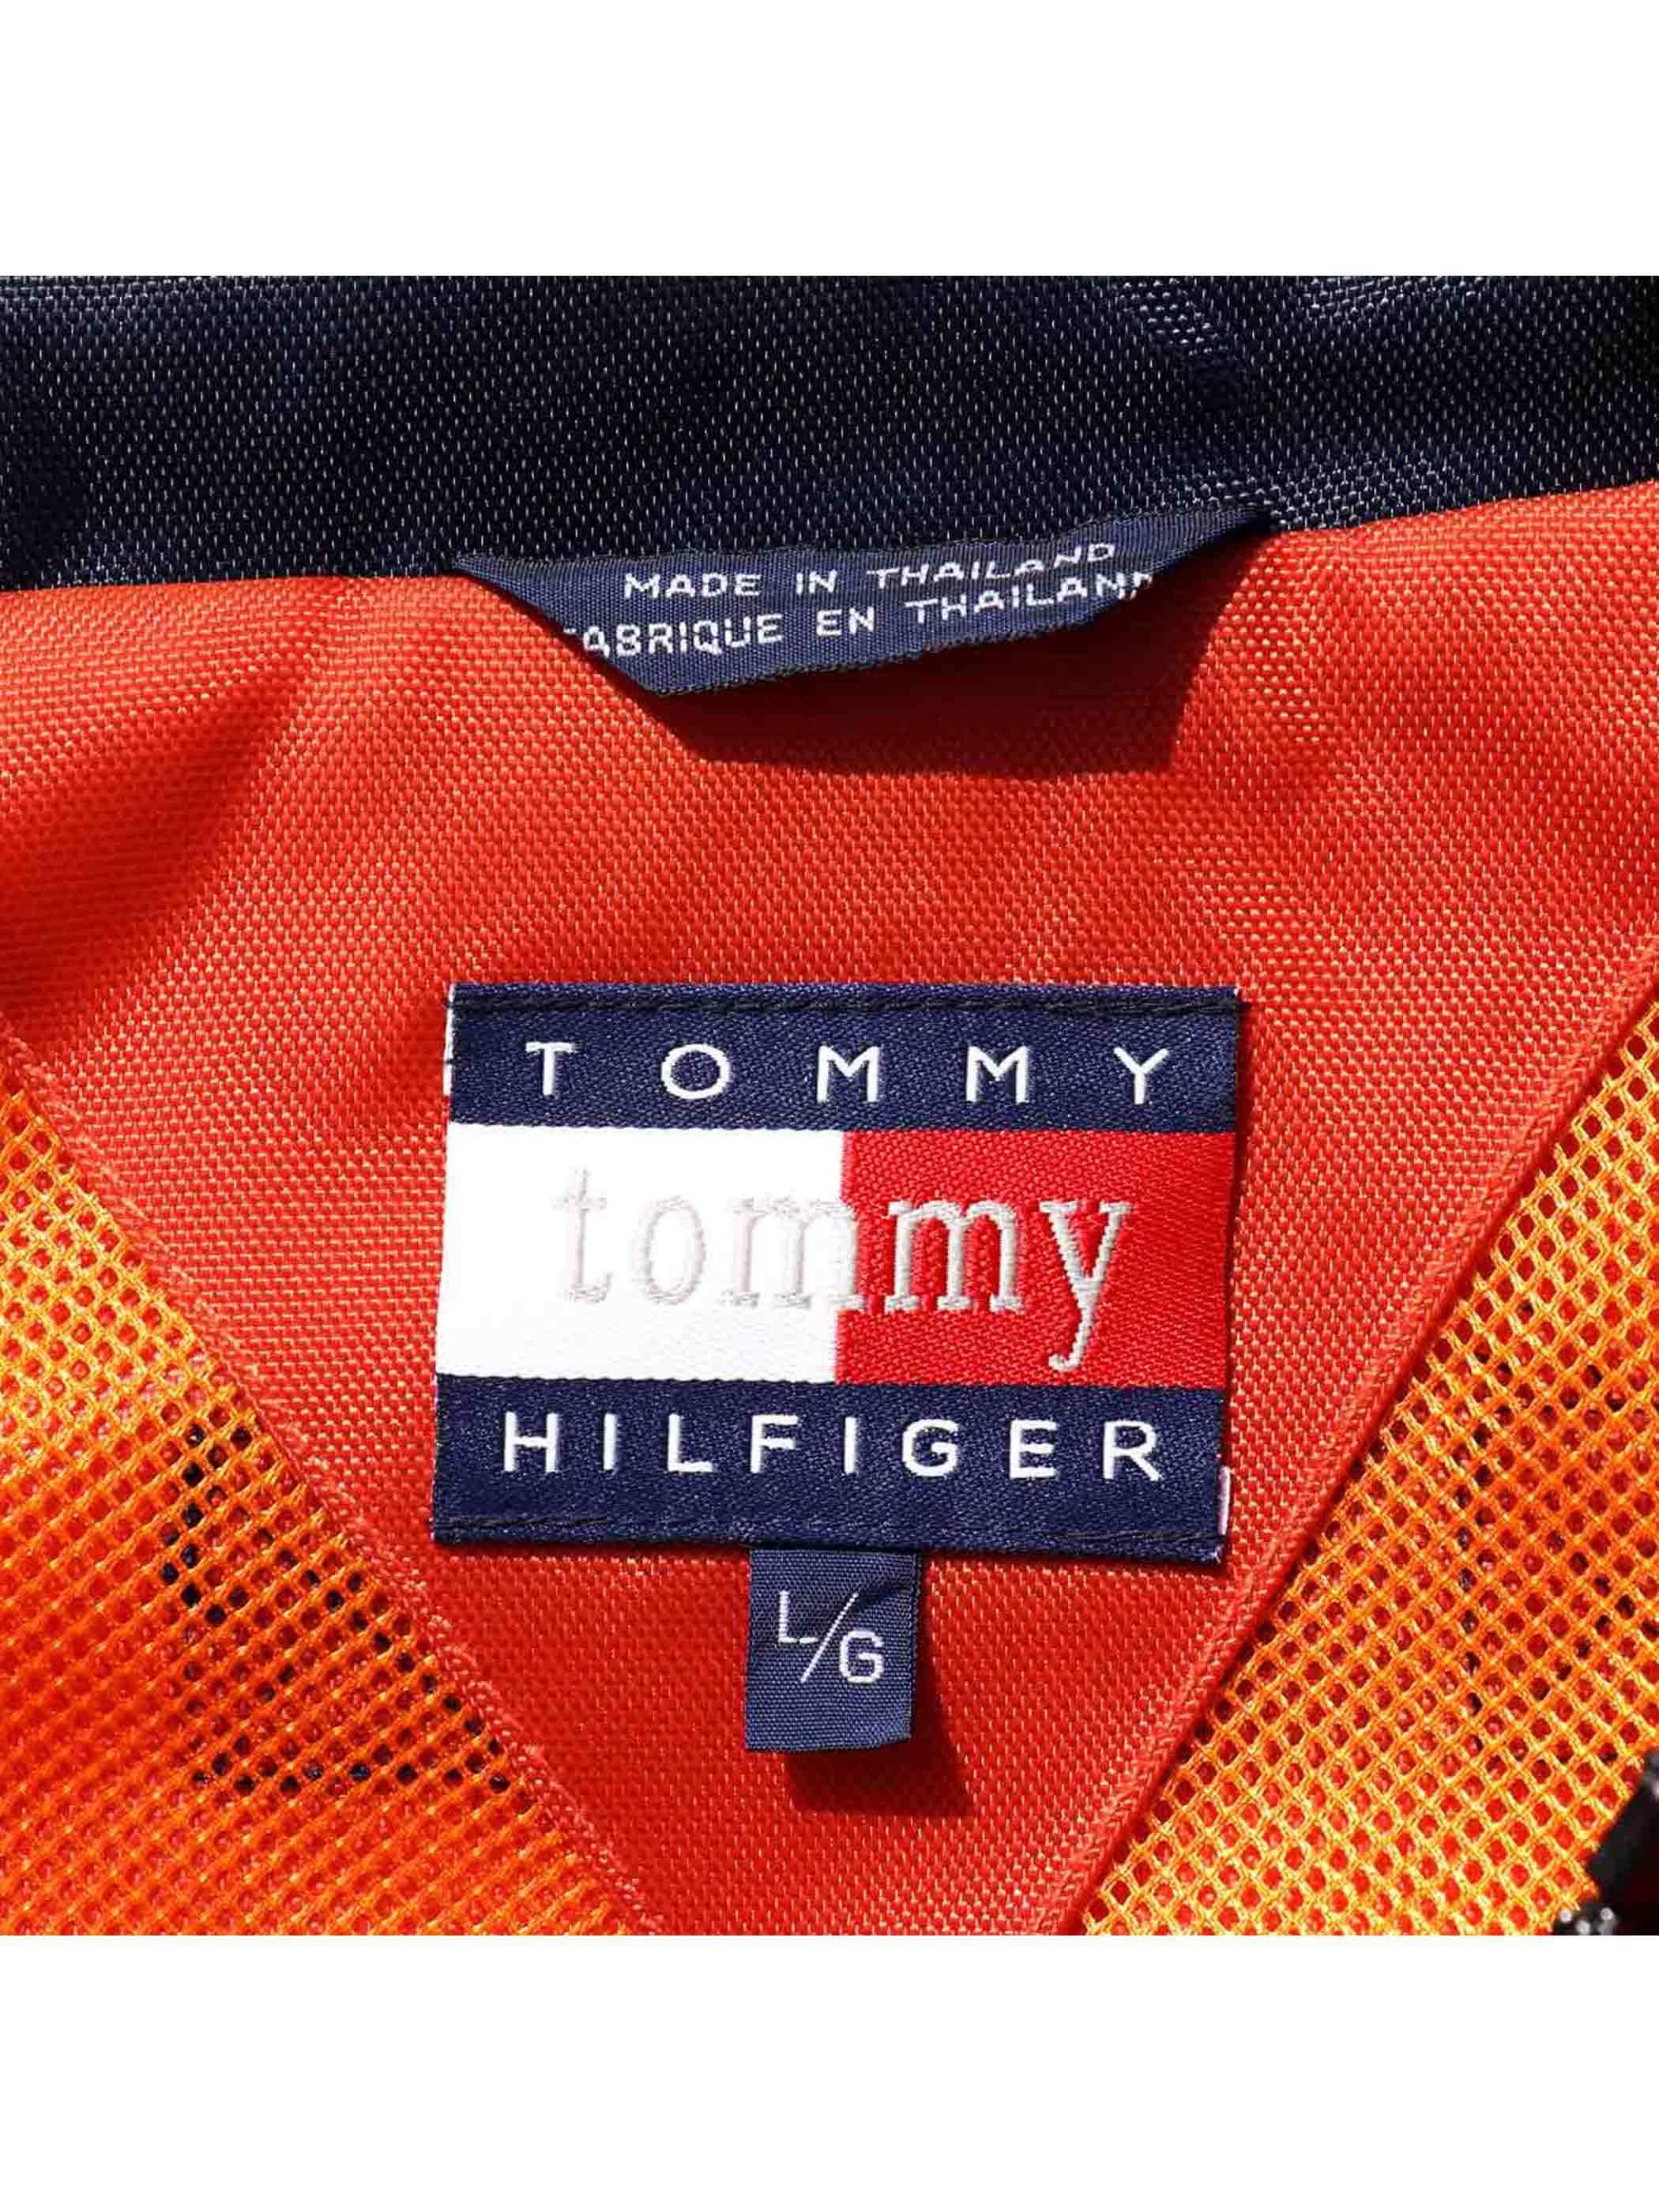 90's TOMMY HILFIGER ナイロンジャケット [L]